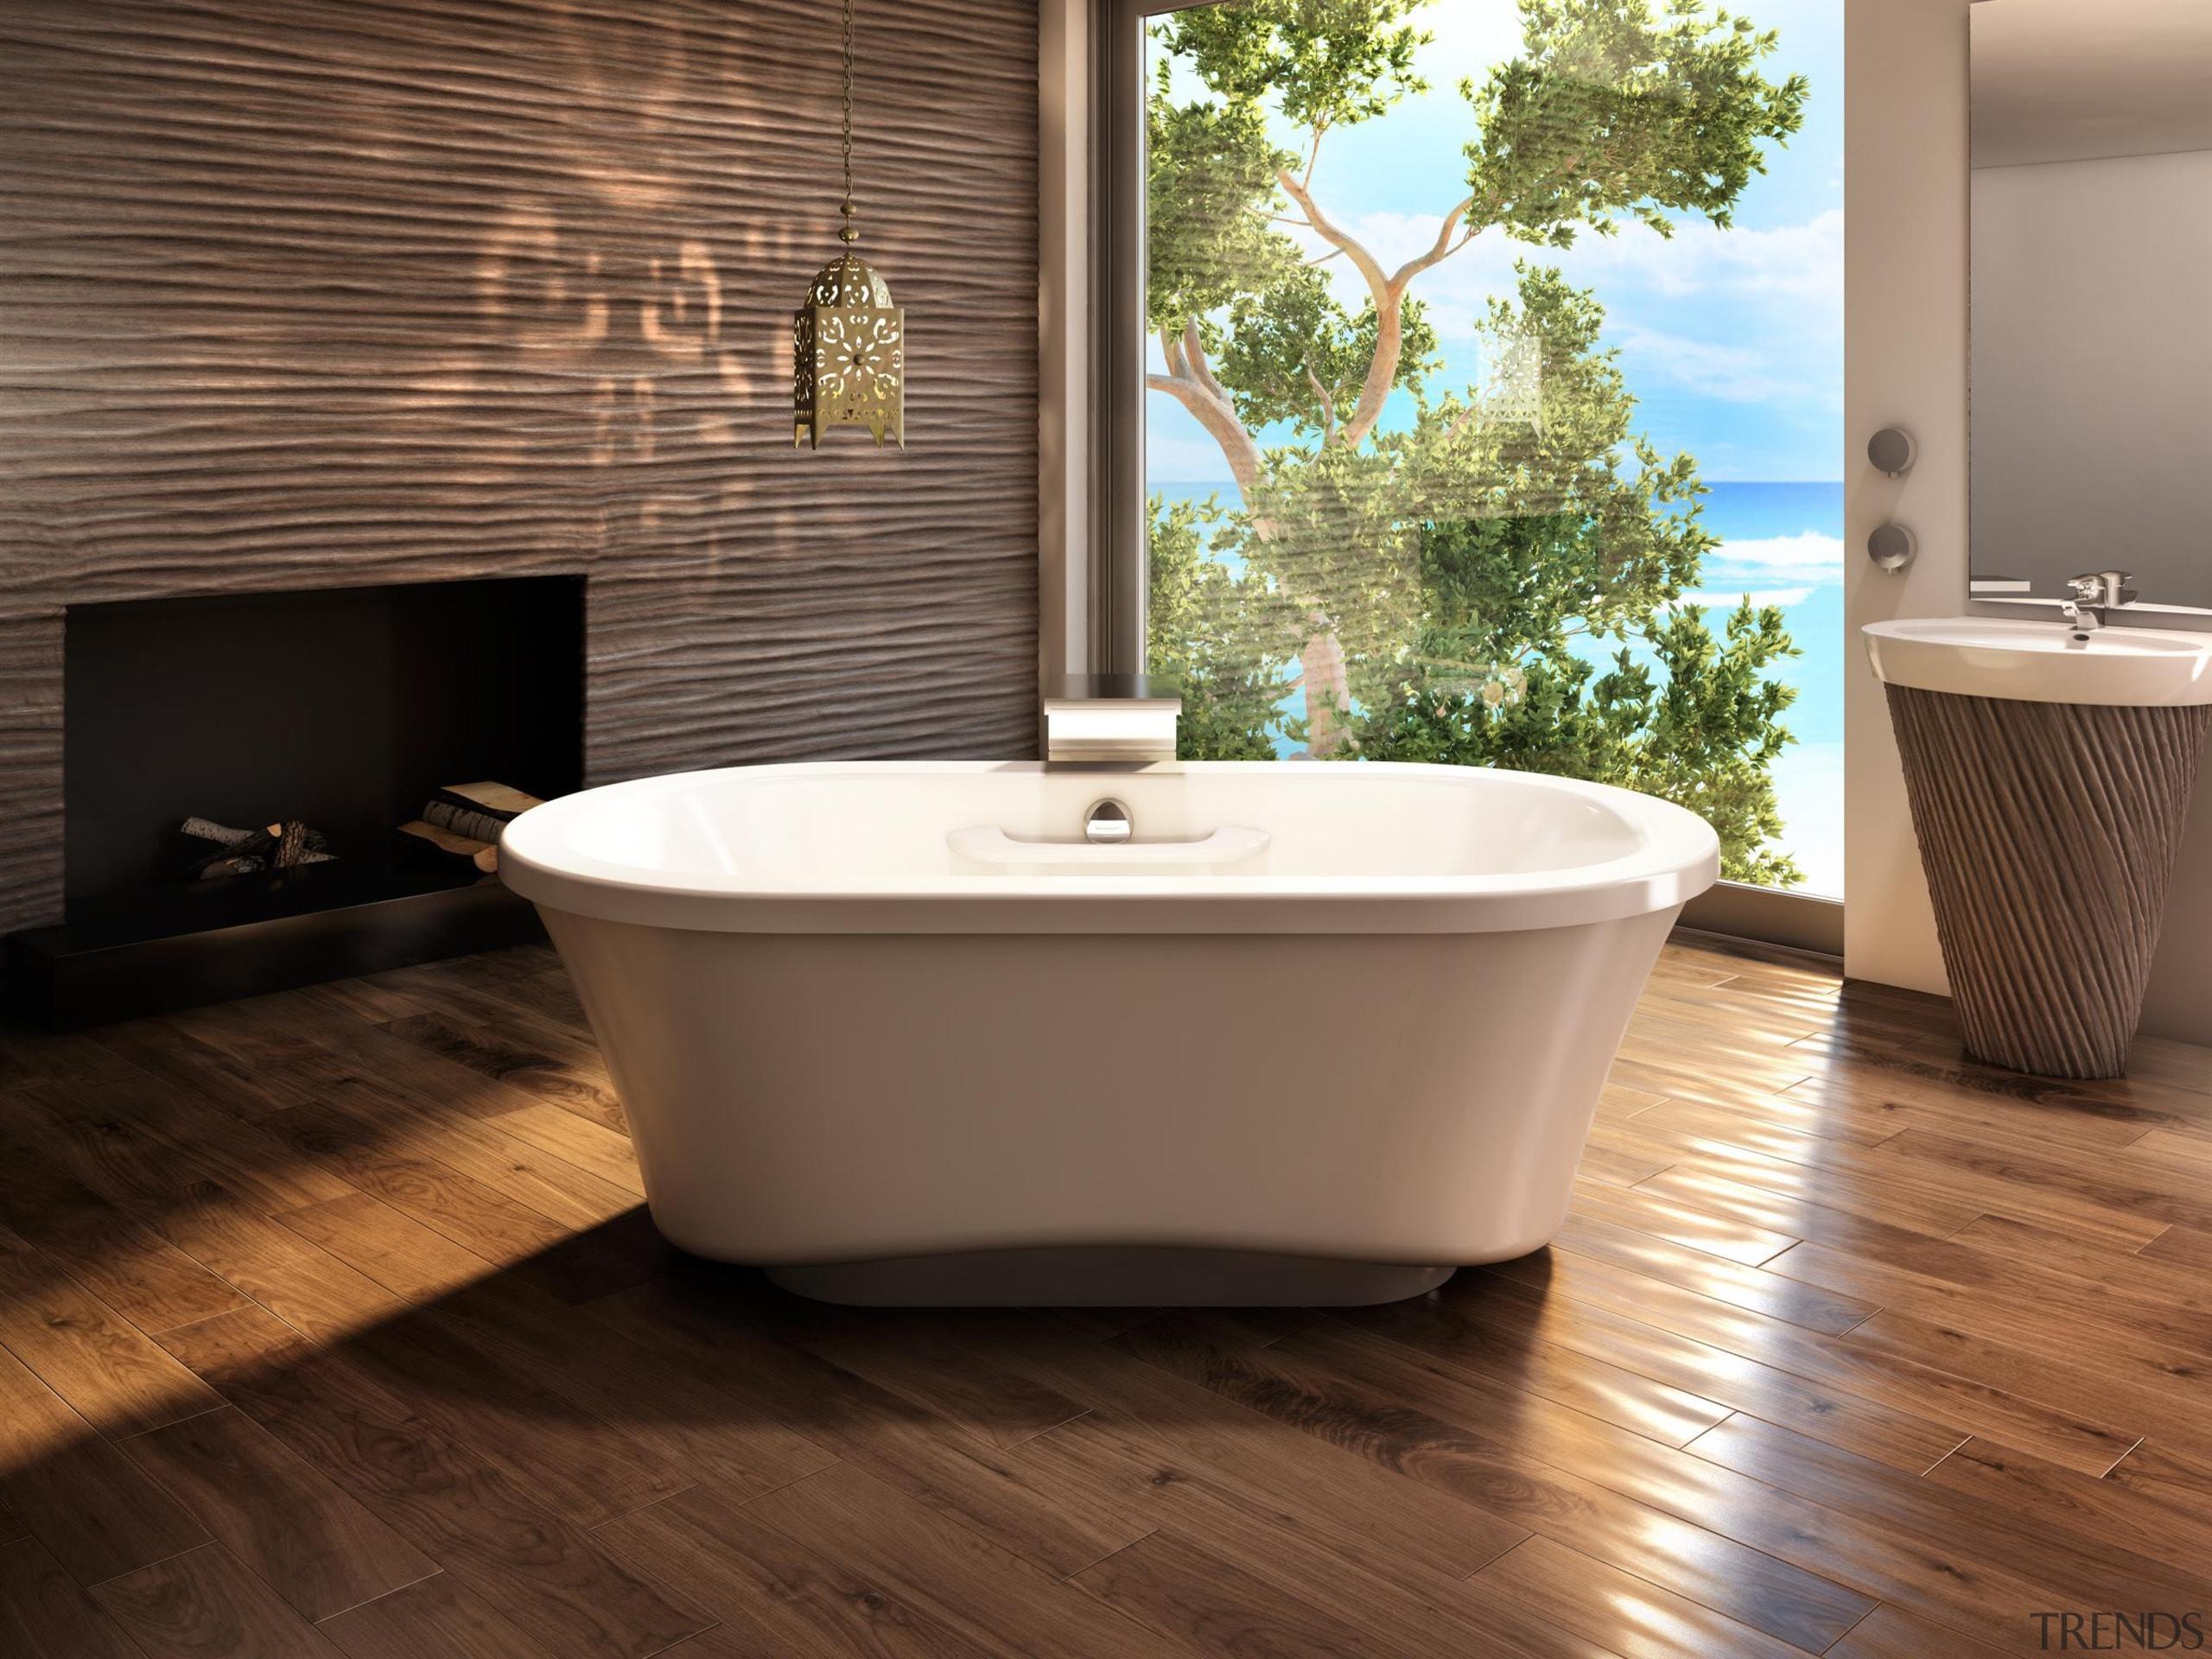 The Amma freestanding with narrow base is designed bathroom, bathtub, ceramic, floor, flooring, hardwood, interior design, plumbing fixture, product design, tile, wood, wood flooring, brown